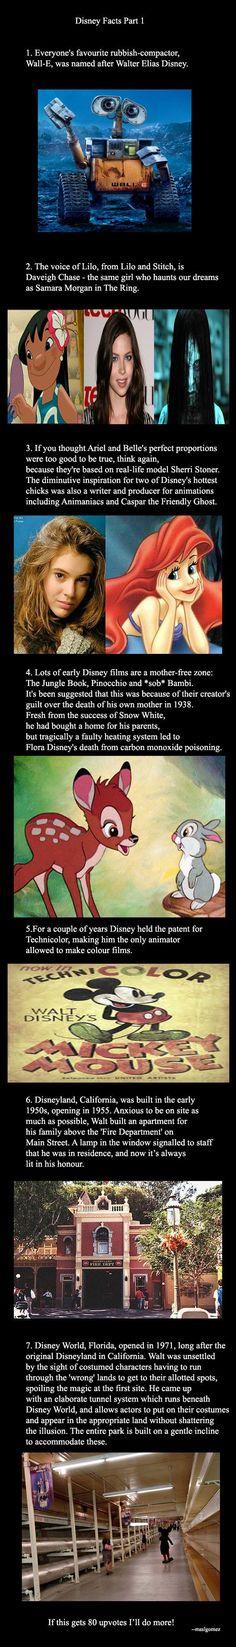 A few interesting Disney facts